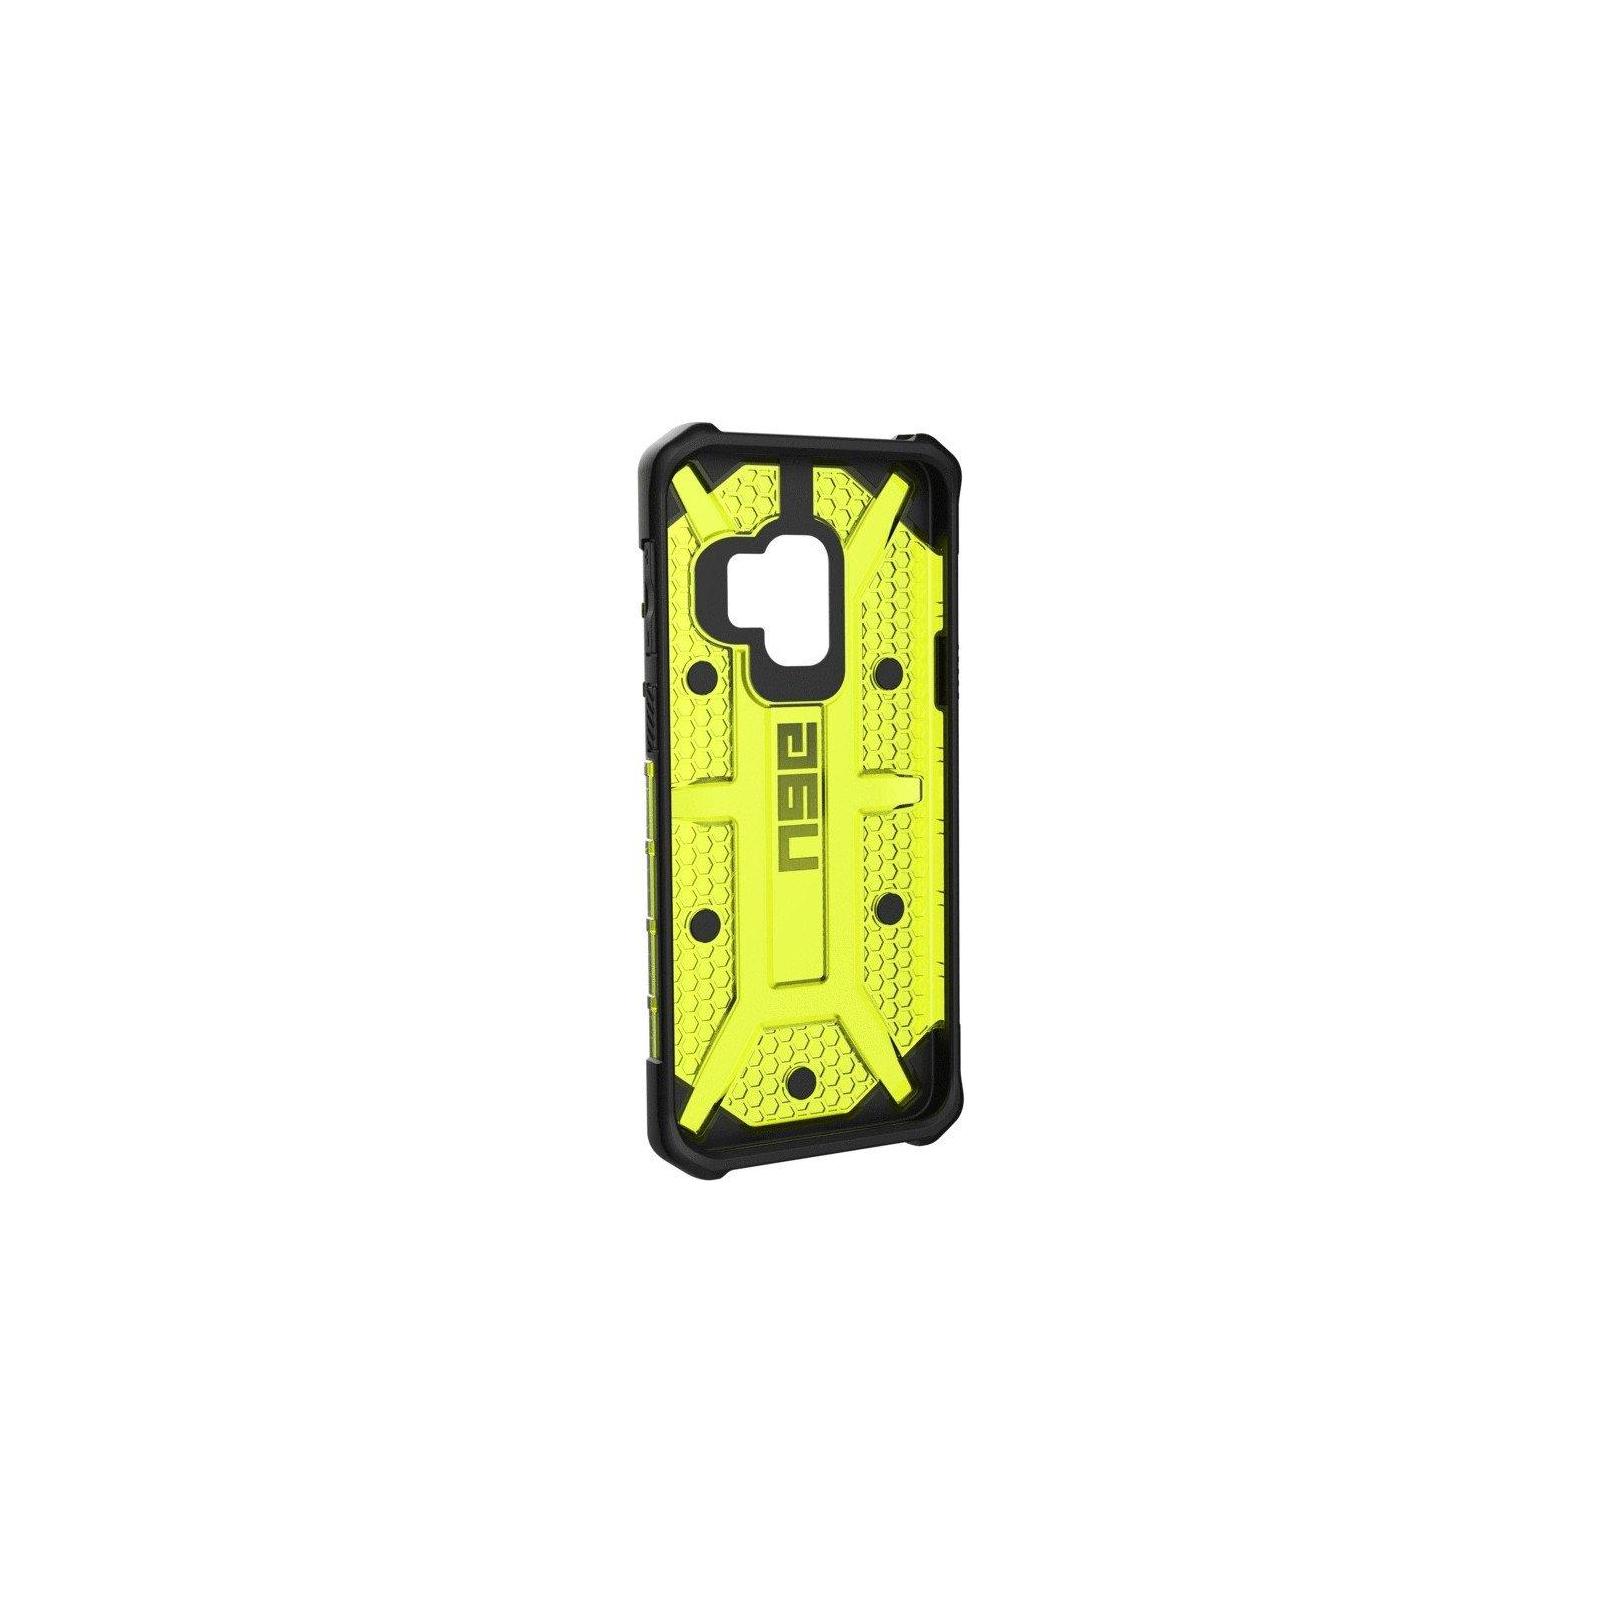 Чехол для моб. телефона Urban Armor Gear Galaxy S9 Plasma Citron (GLXS9-L-CT) изображение 2